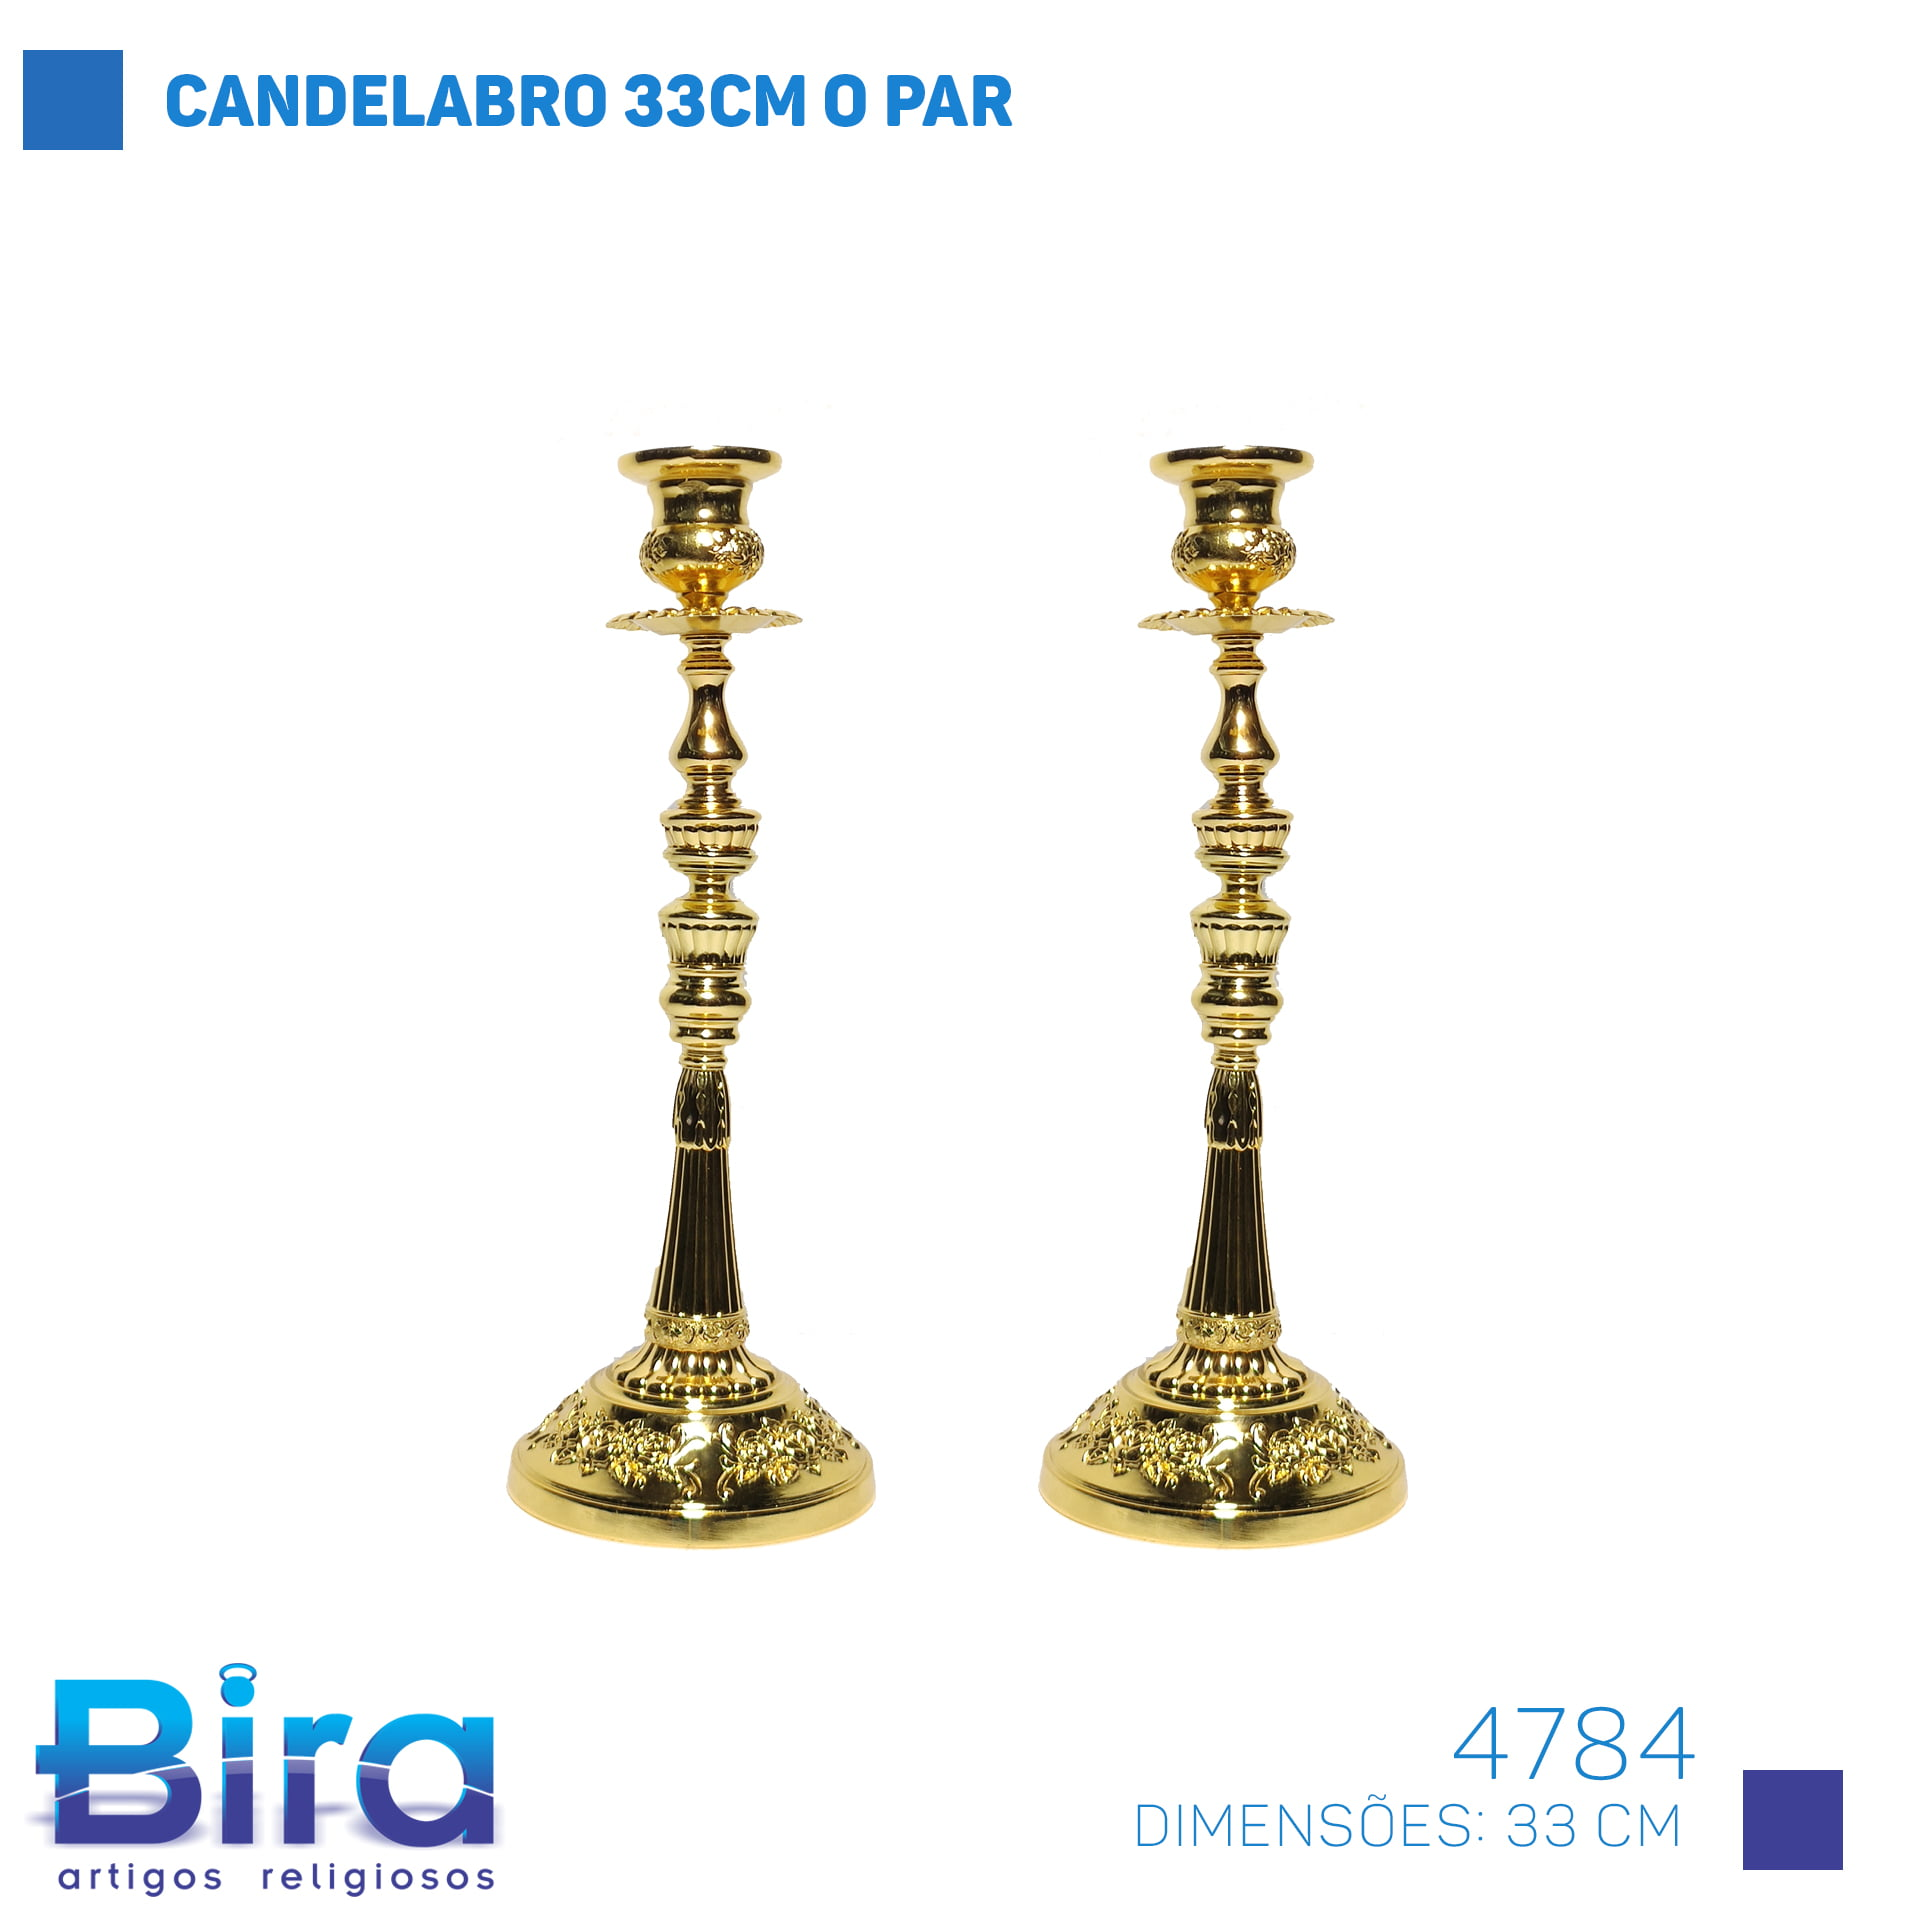 Bira Artigos Religiosos - CANDELABRO 33CM O PAR COD. 4784